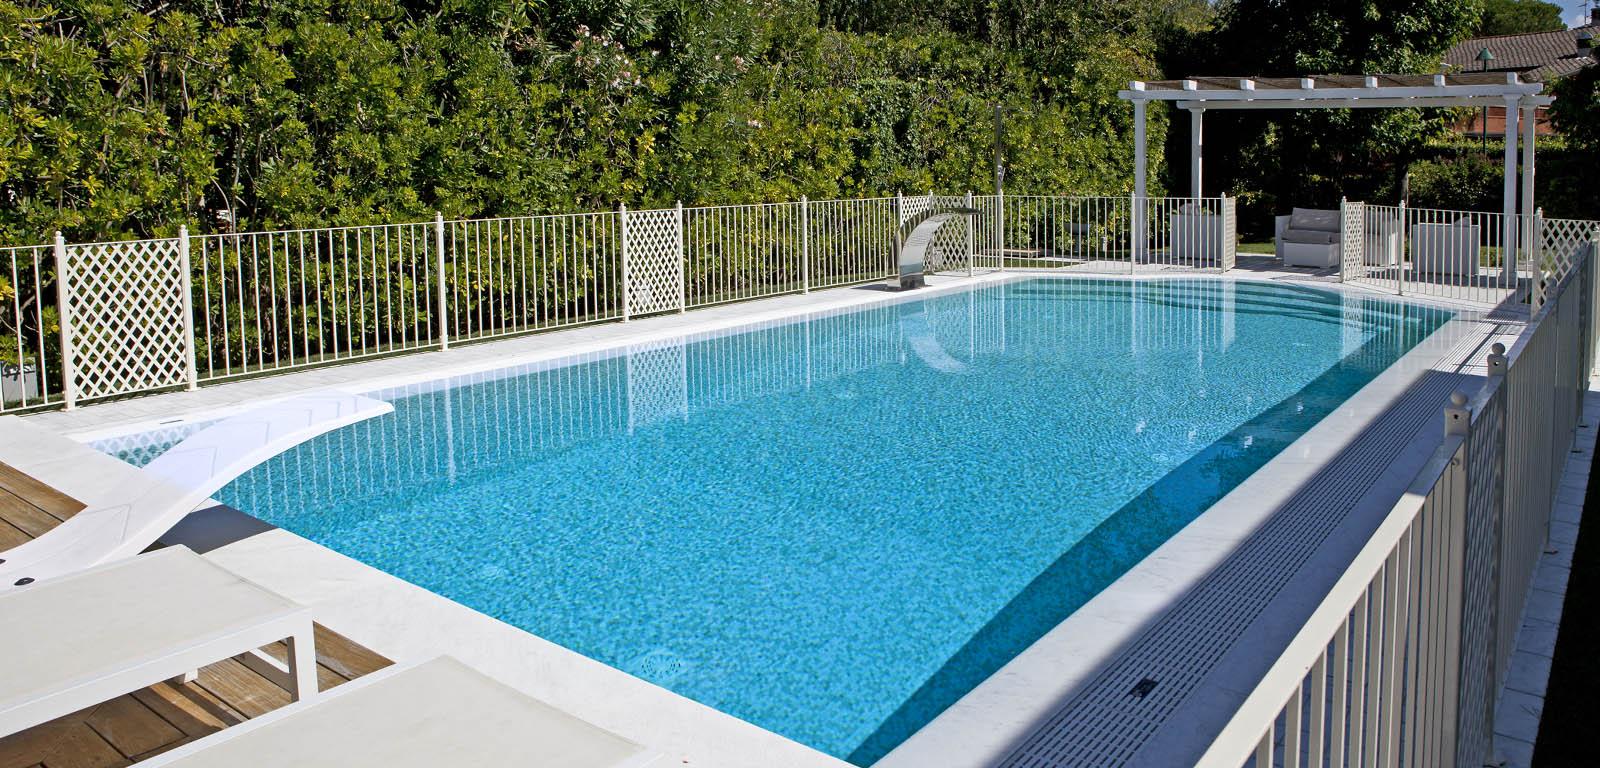 Tecnologie e tipologie lattanzi e silenzi - Bordo perimetrale piscina prezzi ...